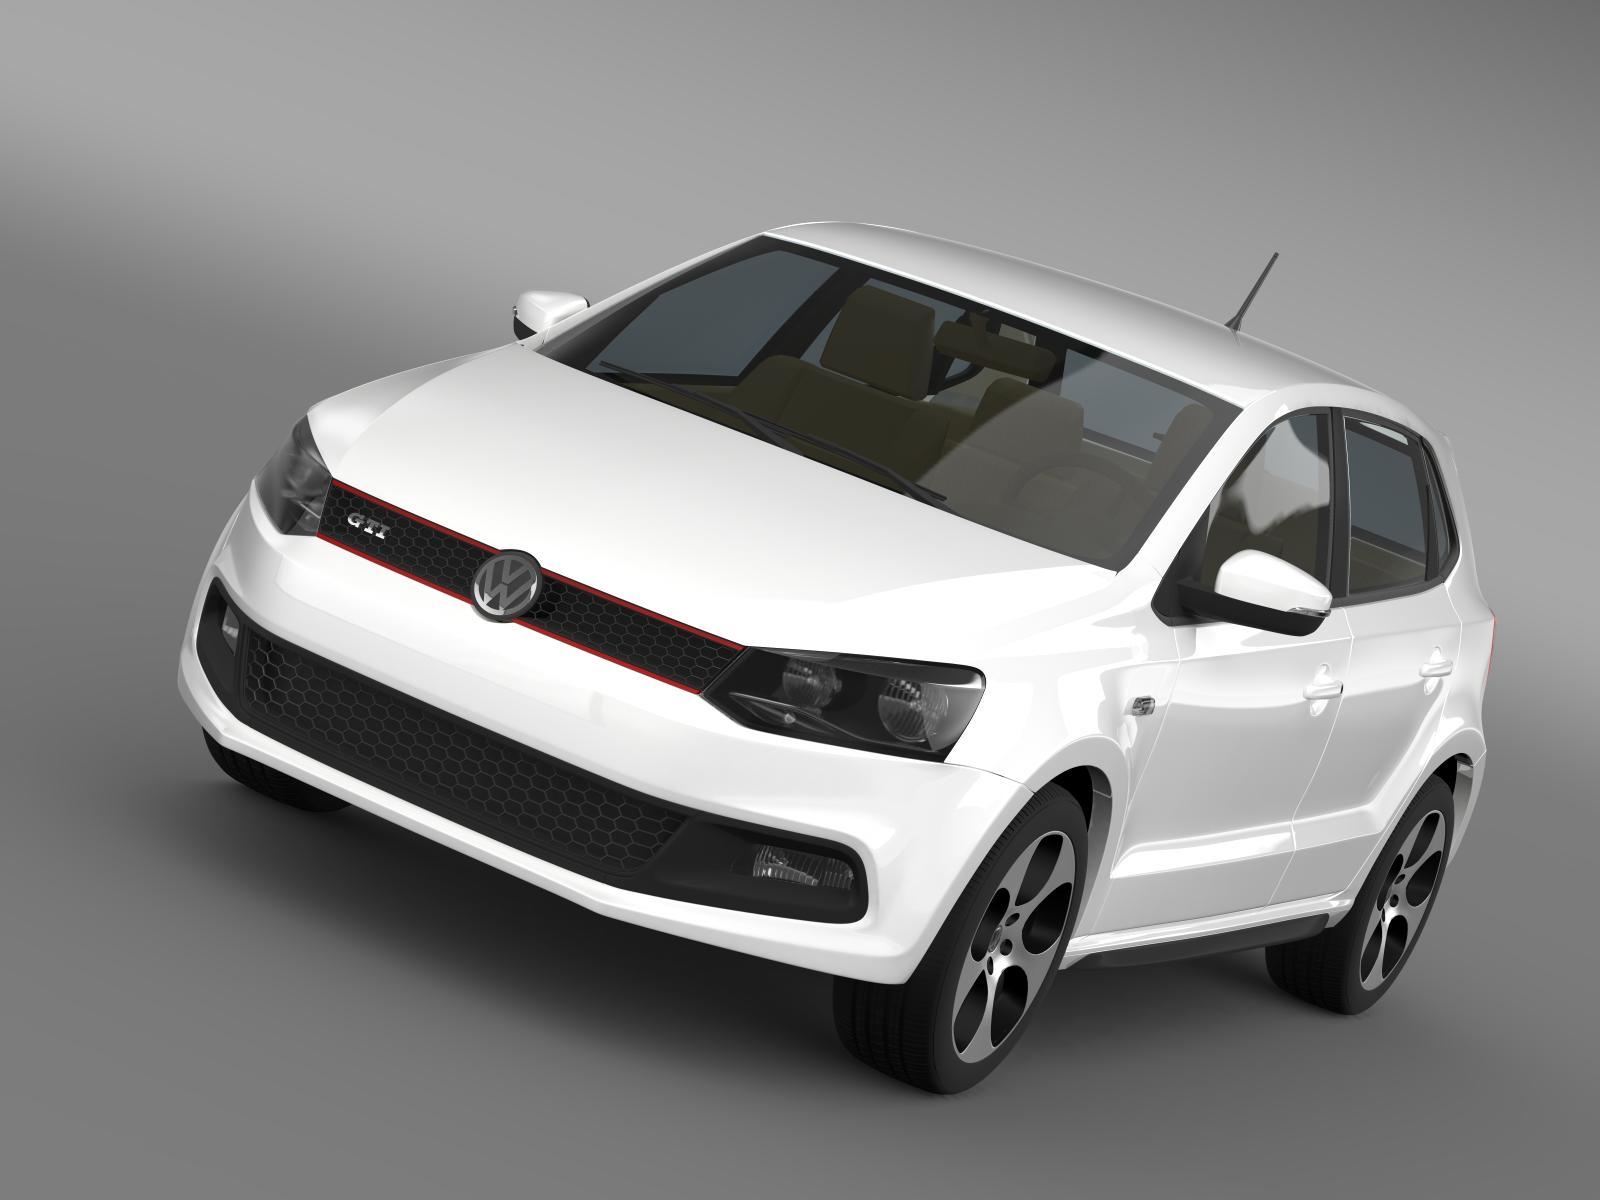 Volkswagen polo gti 5d 2009-2013 3d líkan 3ds hámark fbx c4d lwo ma mb hrc xsi obj 161981